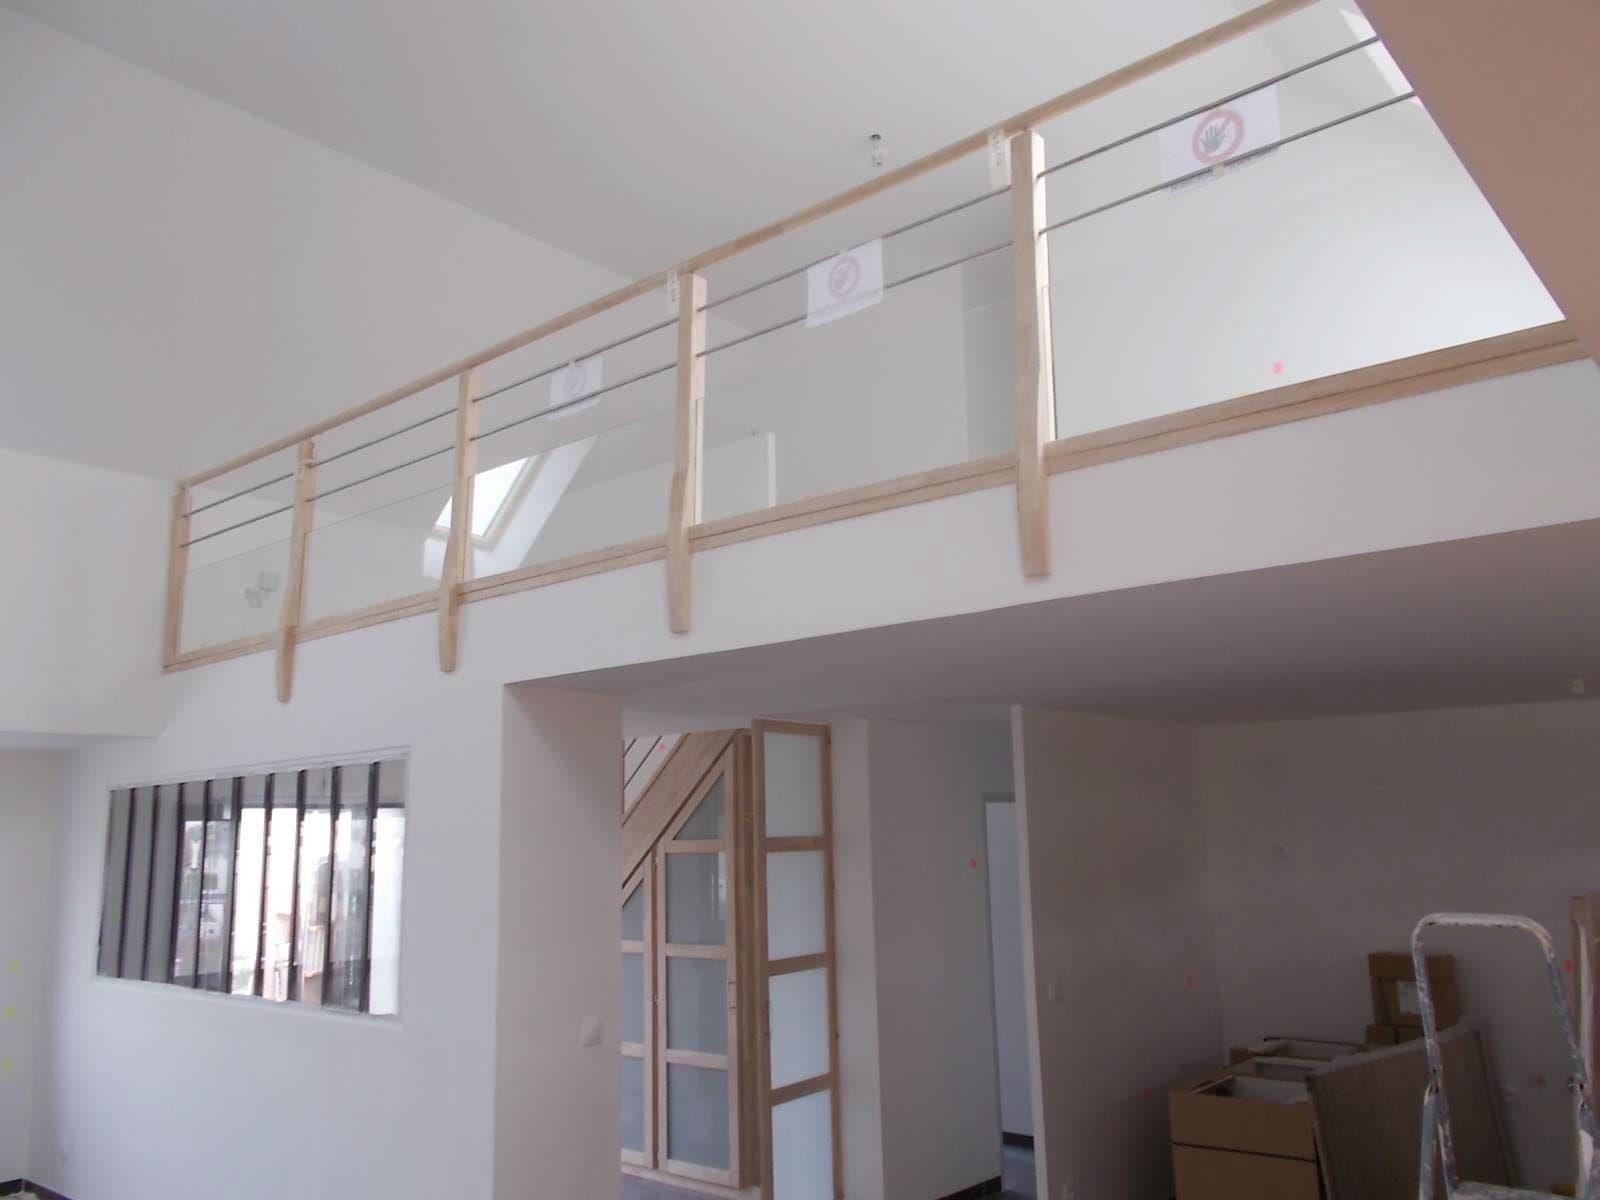 rambarde escalier bois rampe et gardecorps sur escalier. Black Bedroom Furniture Sets. Home Design Ideas